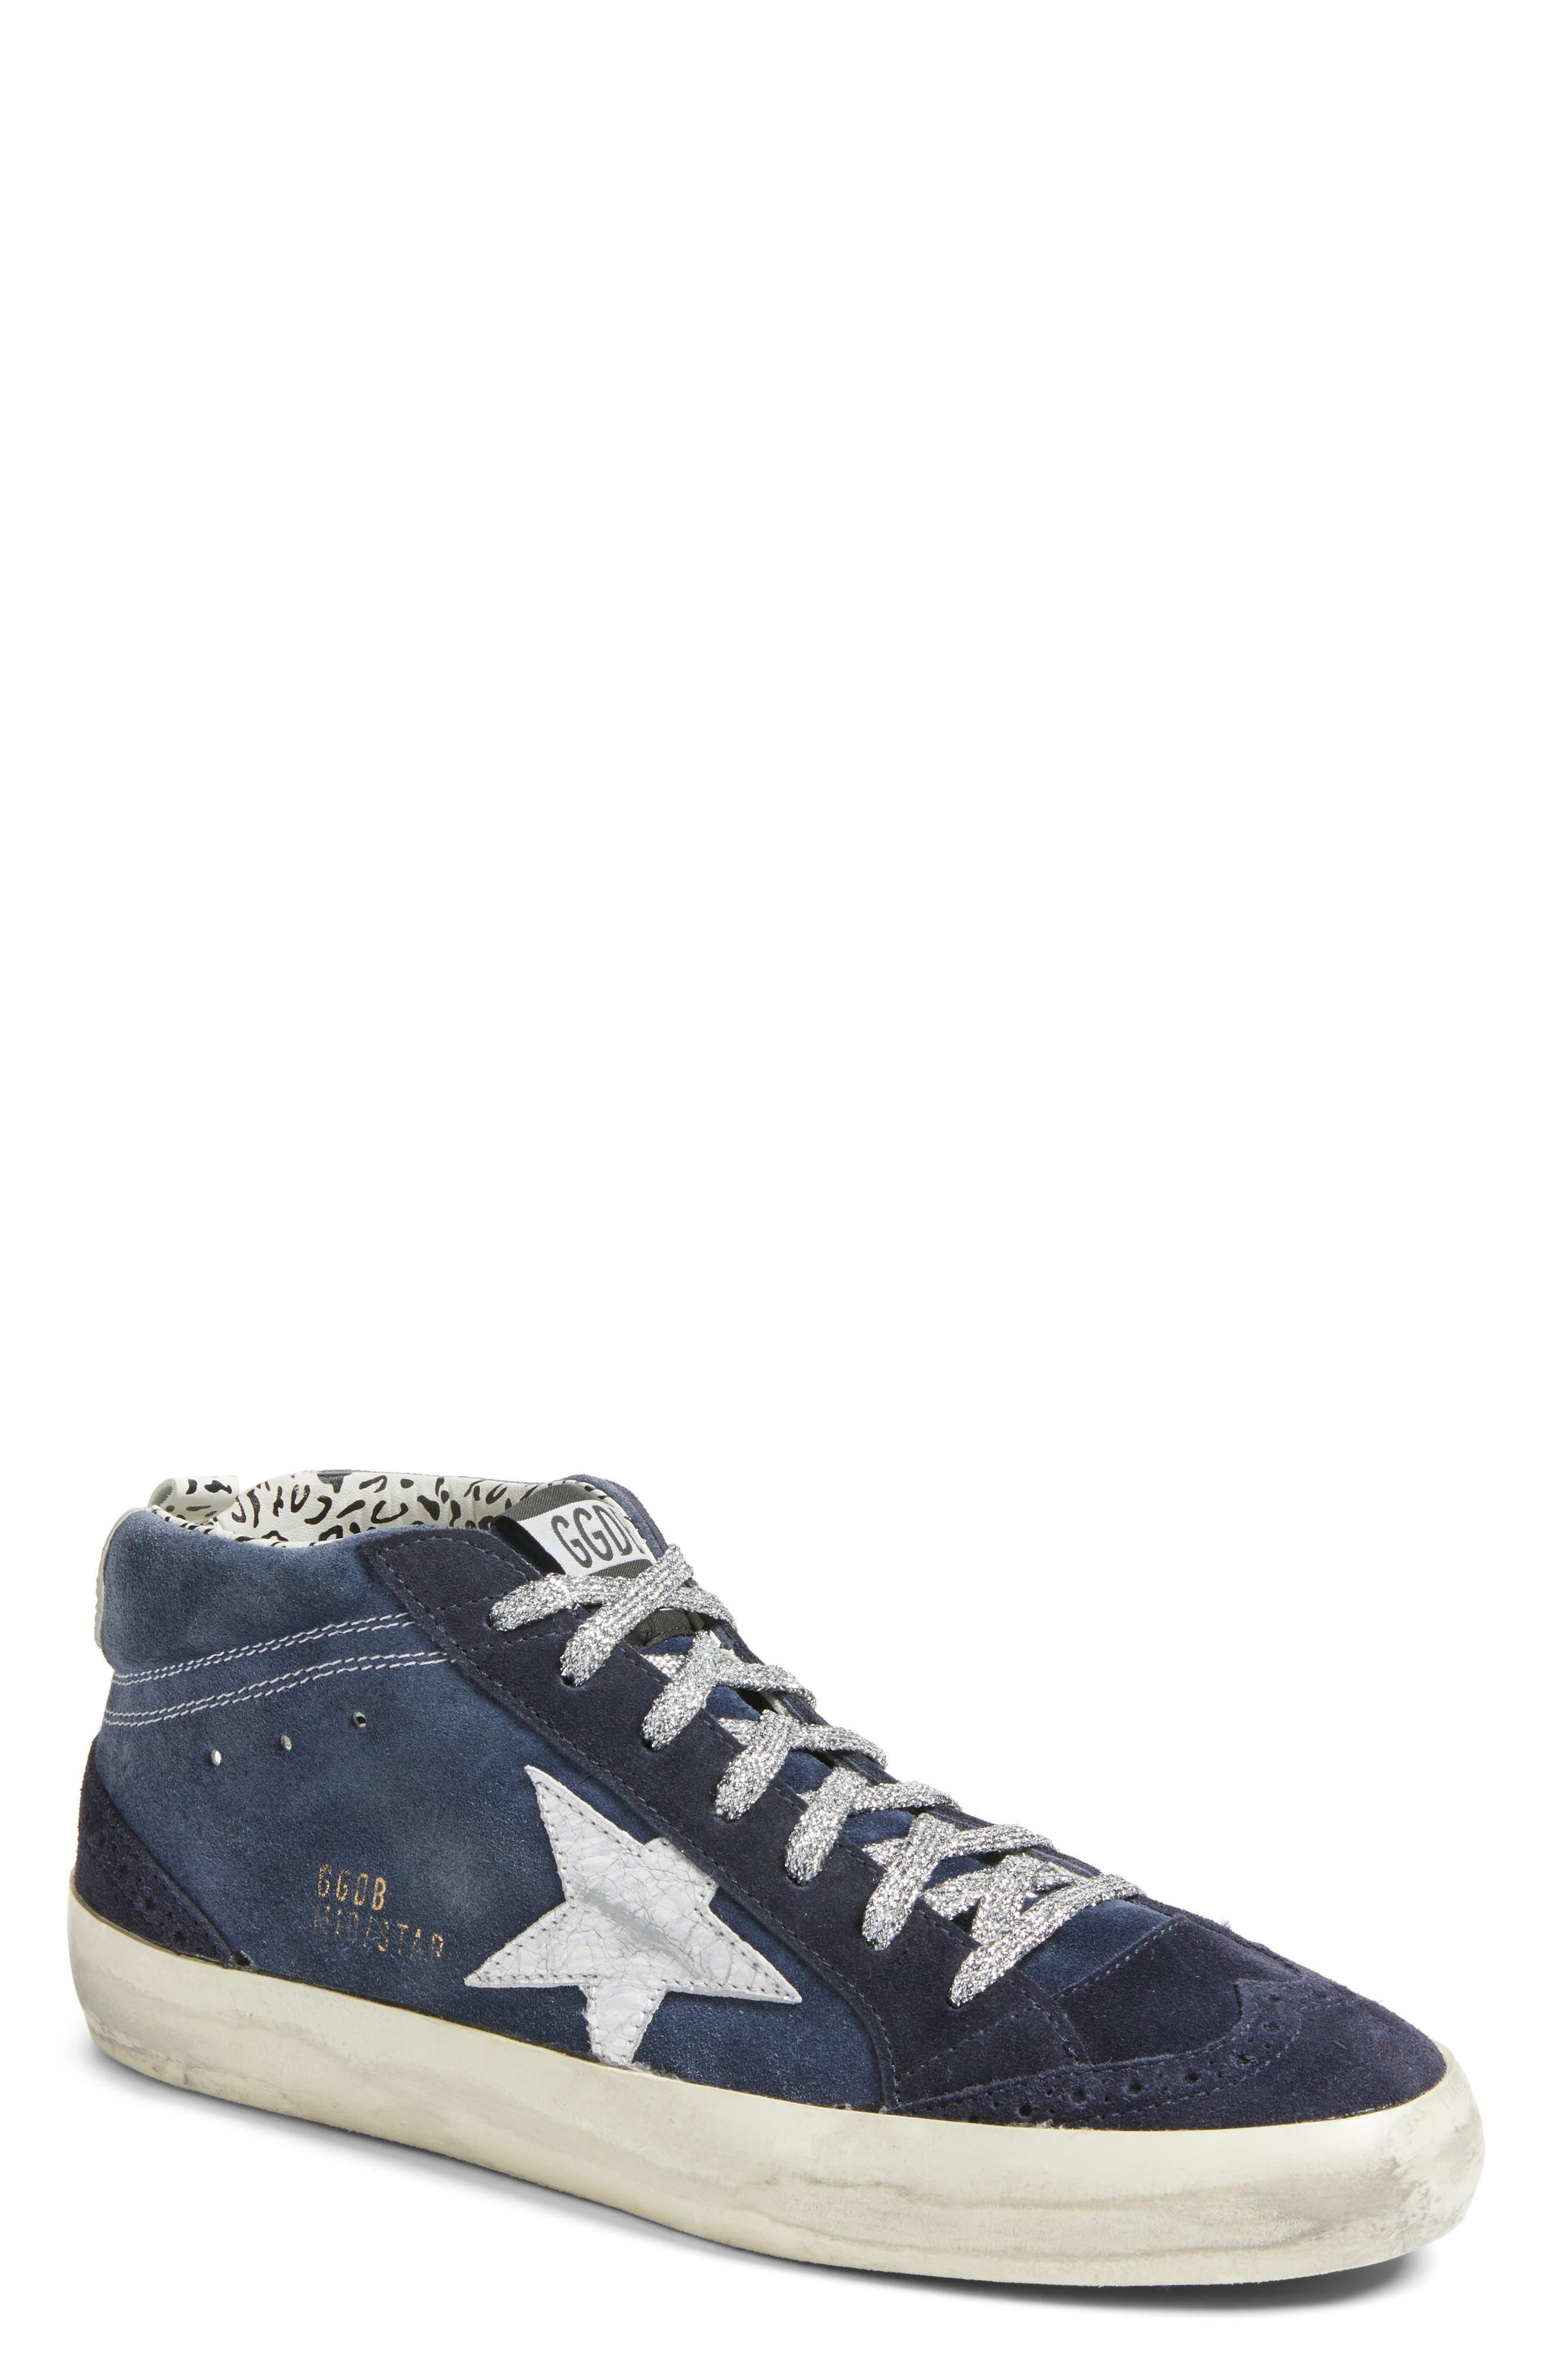 Star Mid Top Sneaker,                         Main,                         color, 401